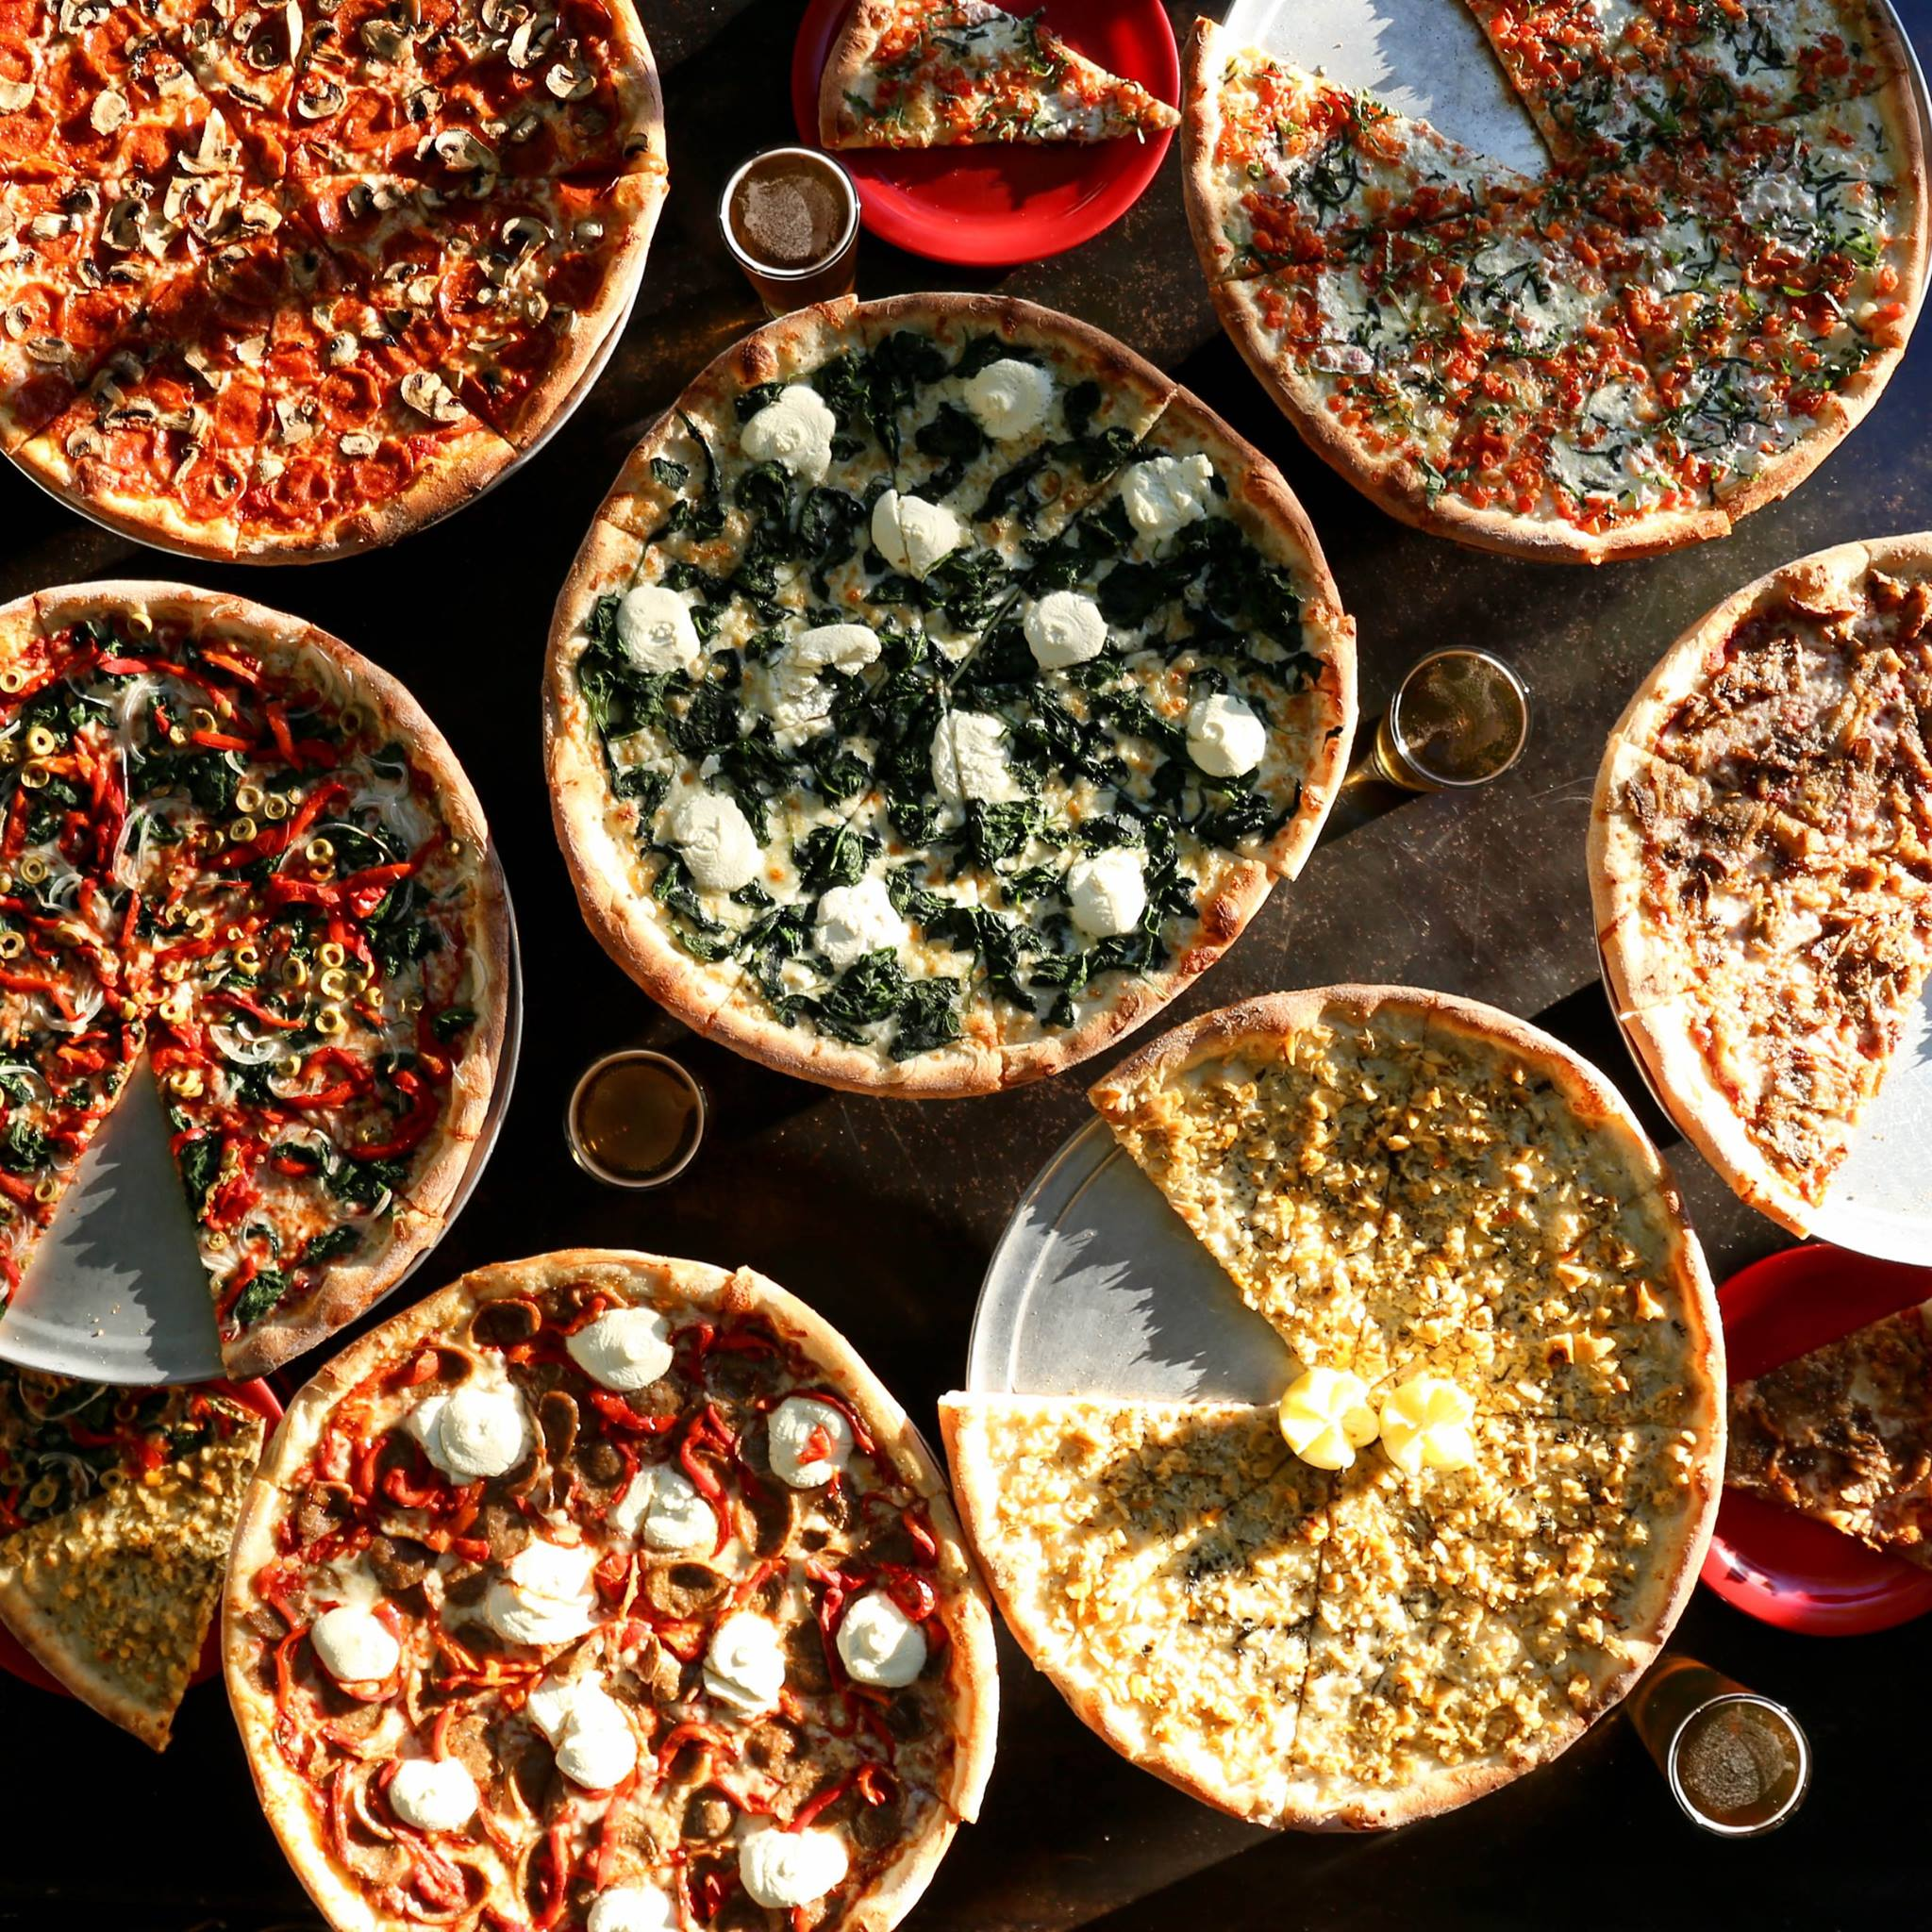 Home Slice's pizza array